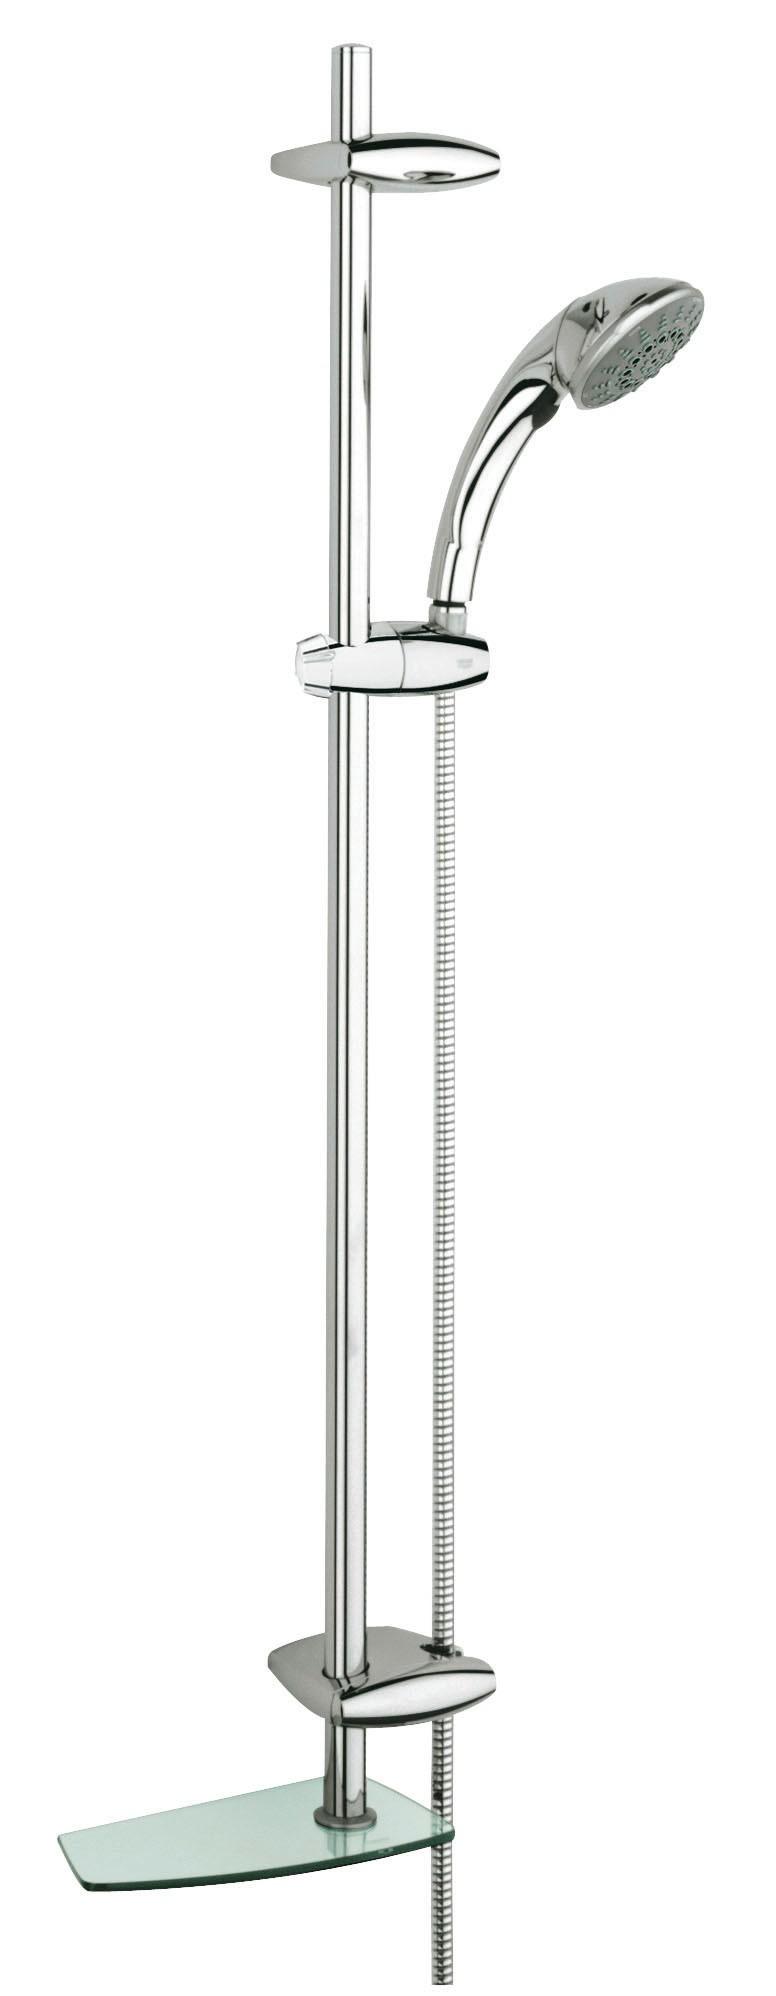 Душевой гарнитур Grohe 28571000 Movario (ручной душ, штанга 900 мм, шланг 1750 мм), хром